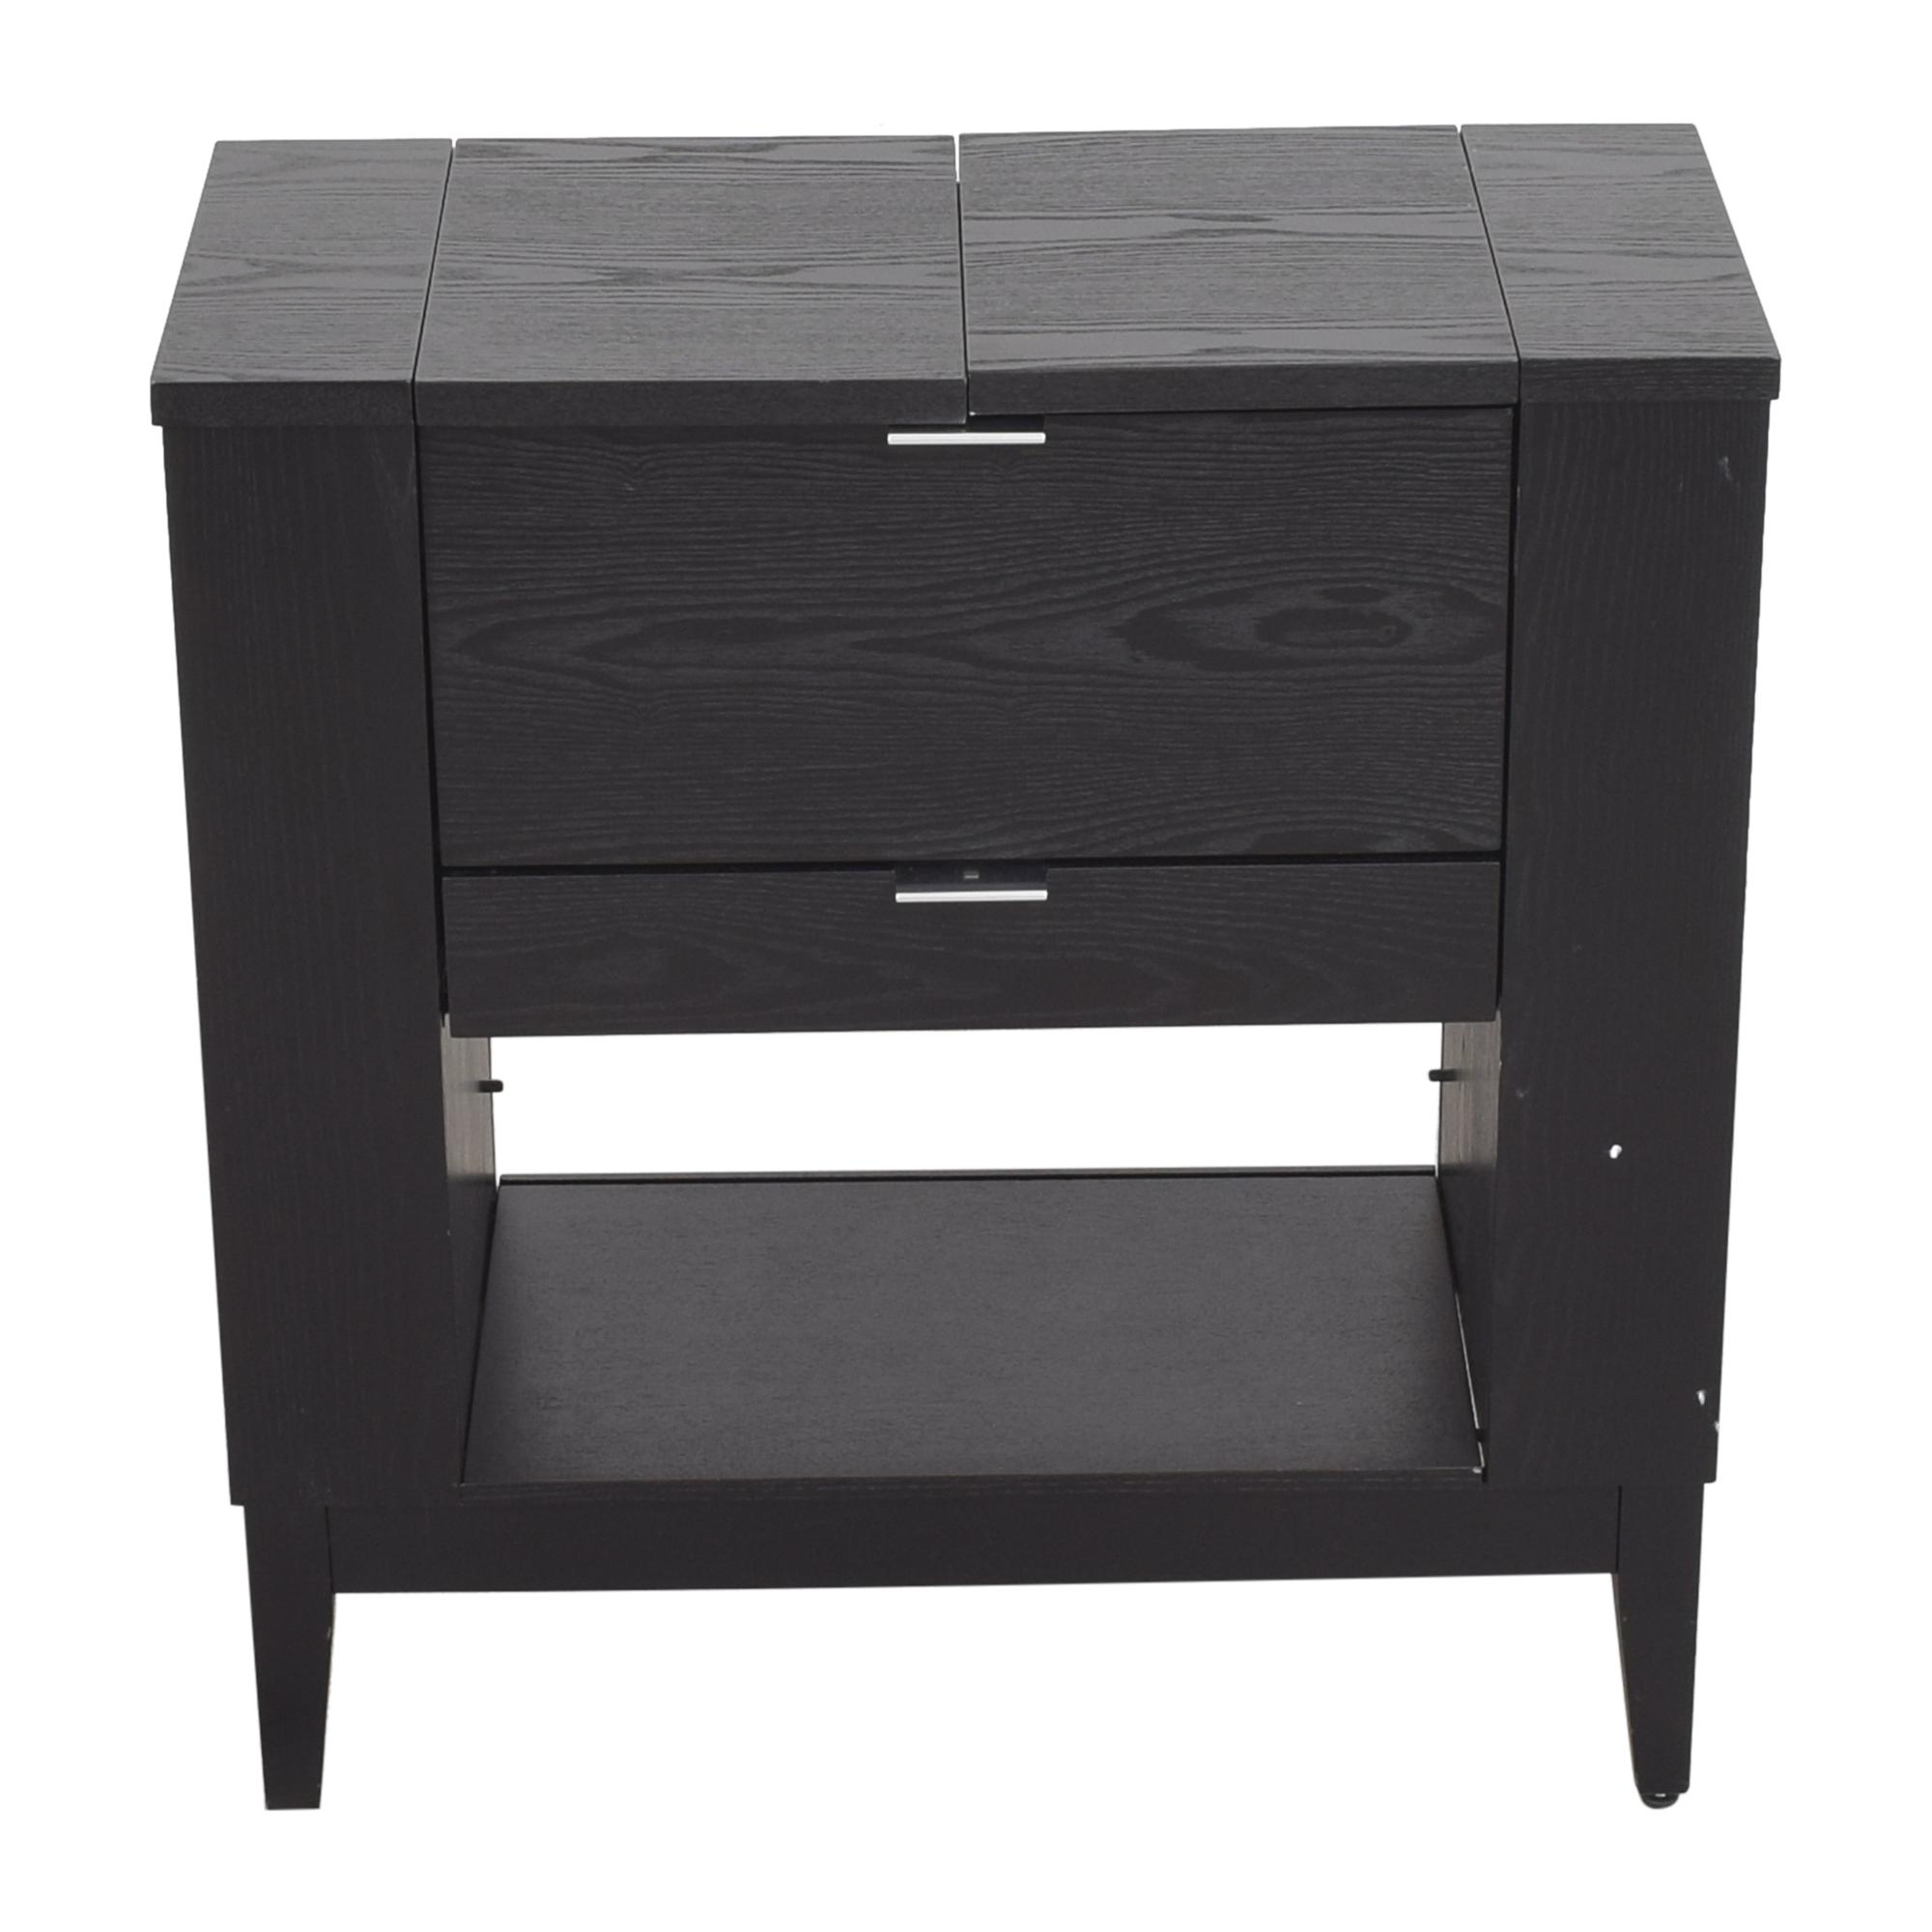 Crate & Barrel Crate & Barrel Parker Spirits Bar Cabinet price